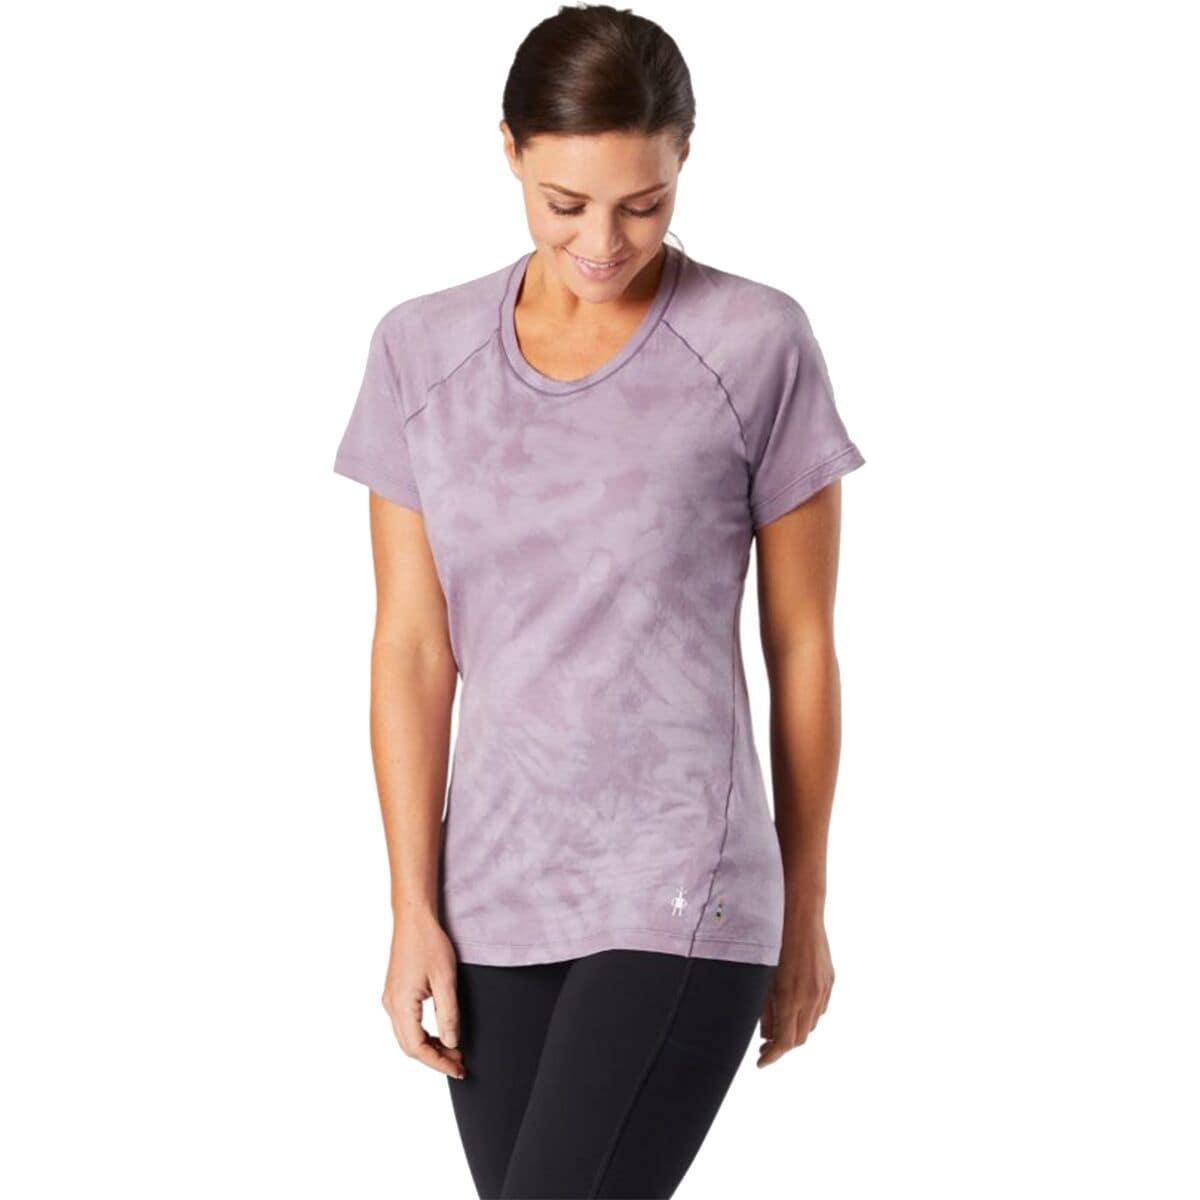 Merino 150 Short-Sleeve Baselayer Top - Women